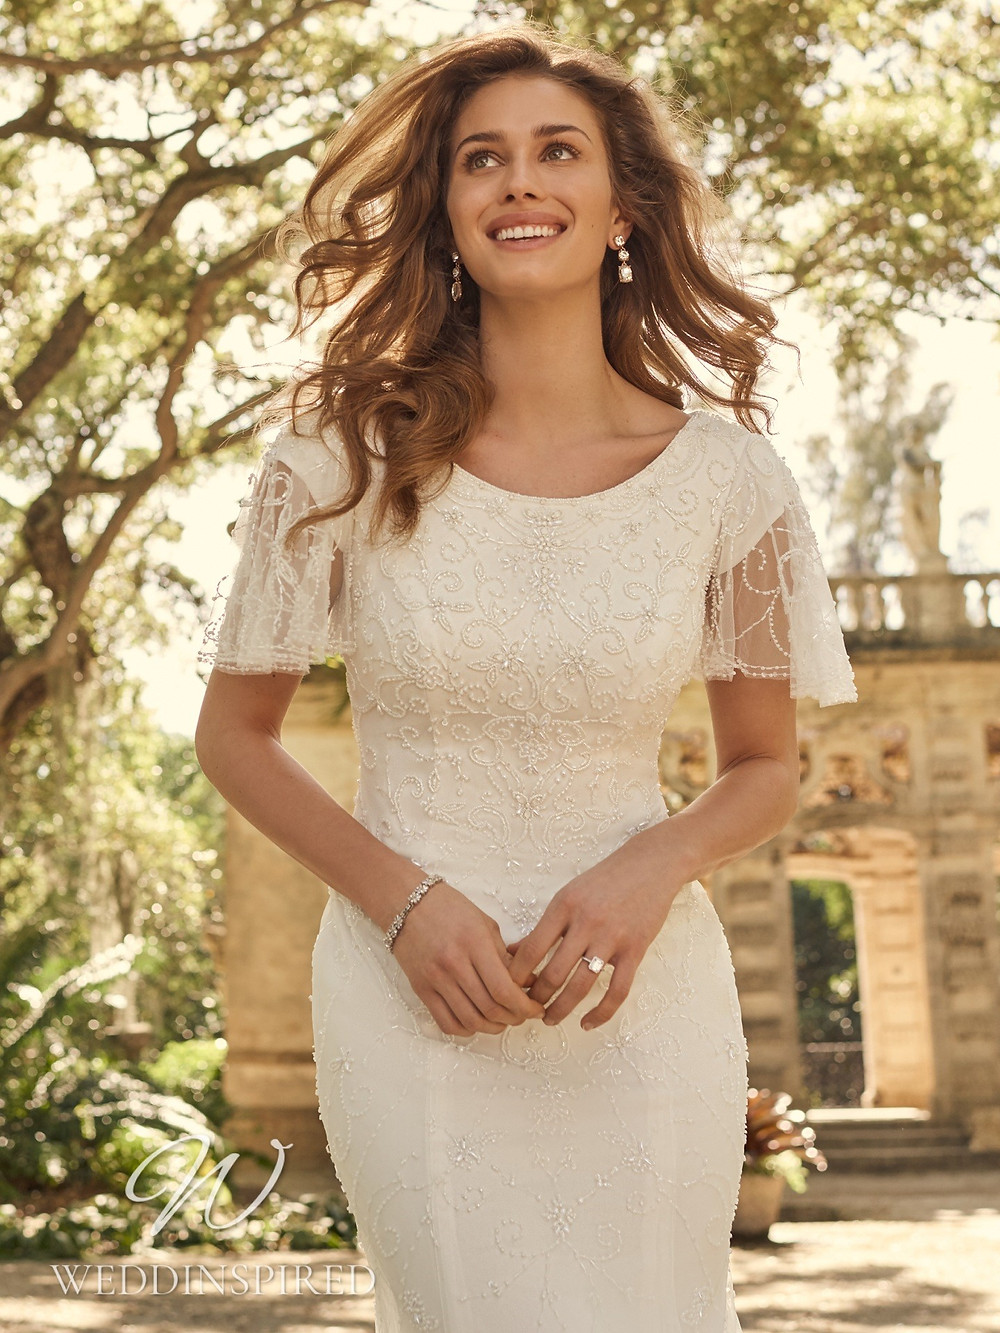 A Maggie Sottero 2021 simple beaded mermaid wedding dress